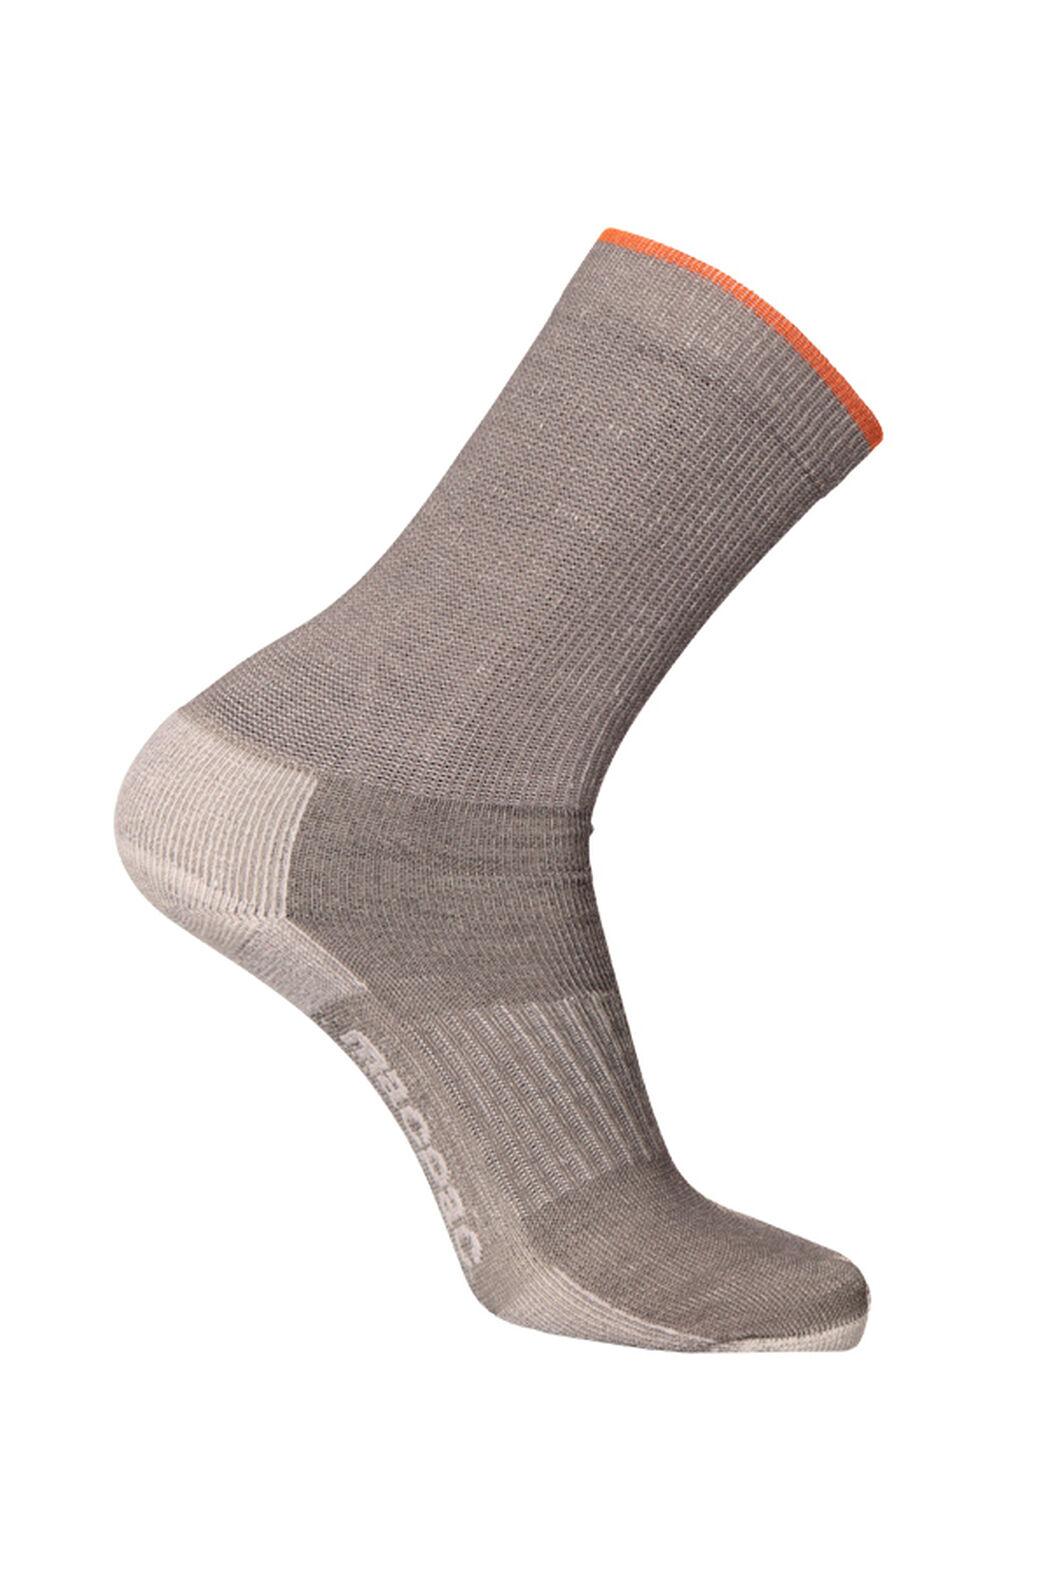 Macpac Light Hiker Socks, Anthracite, hi-res